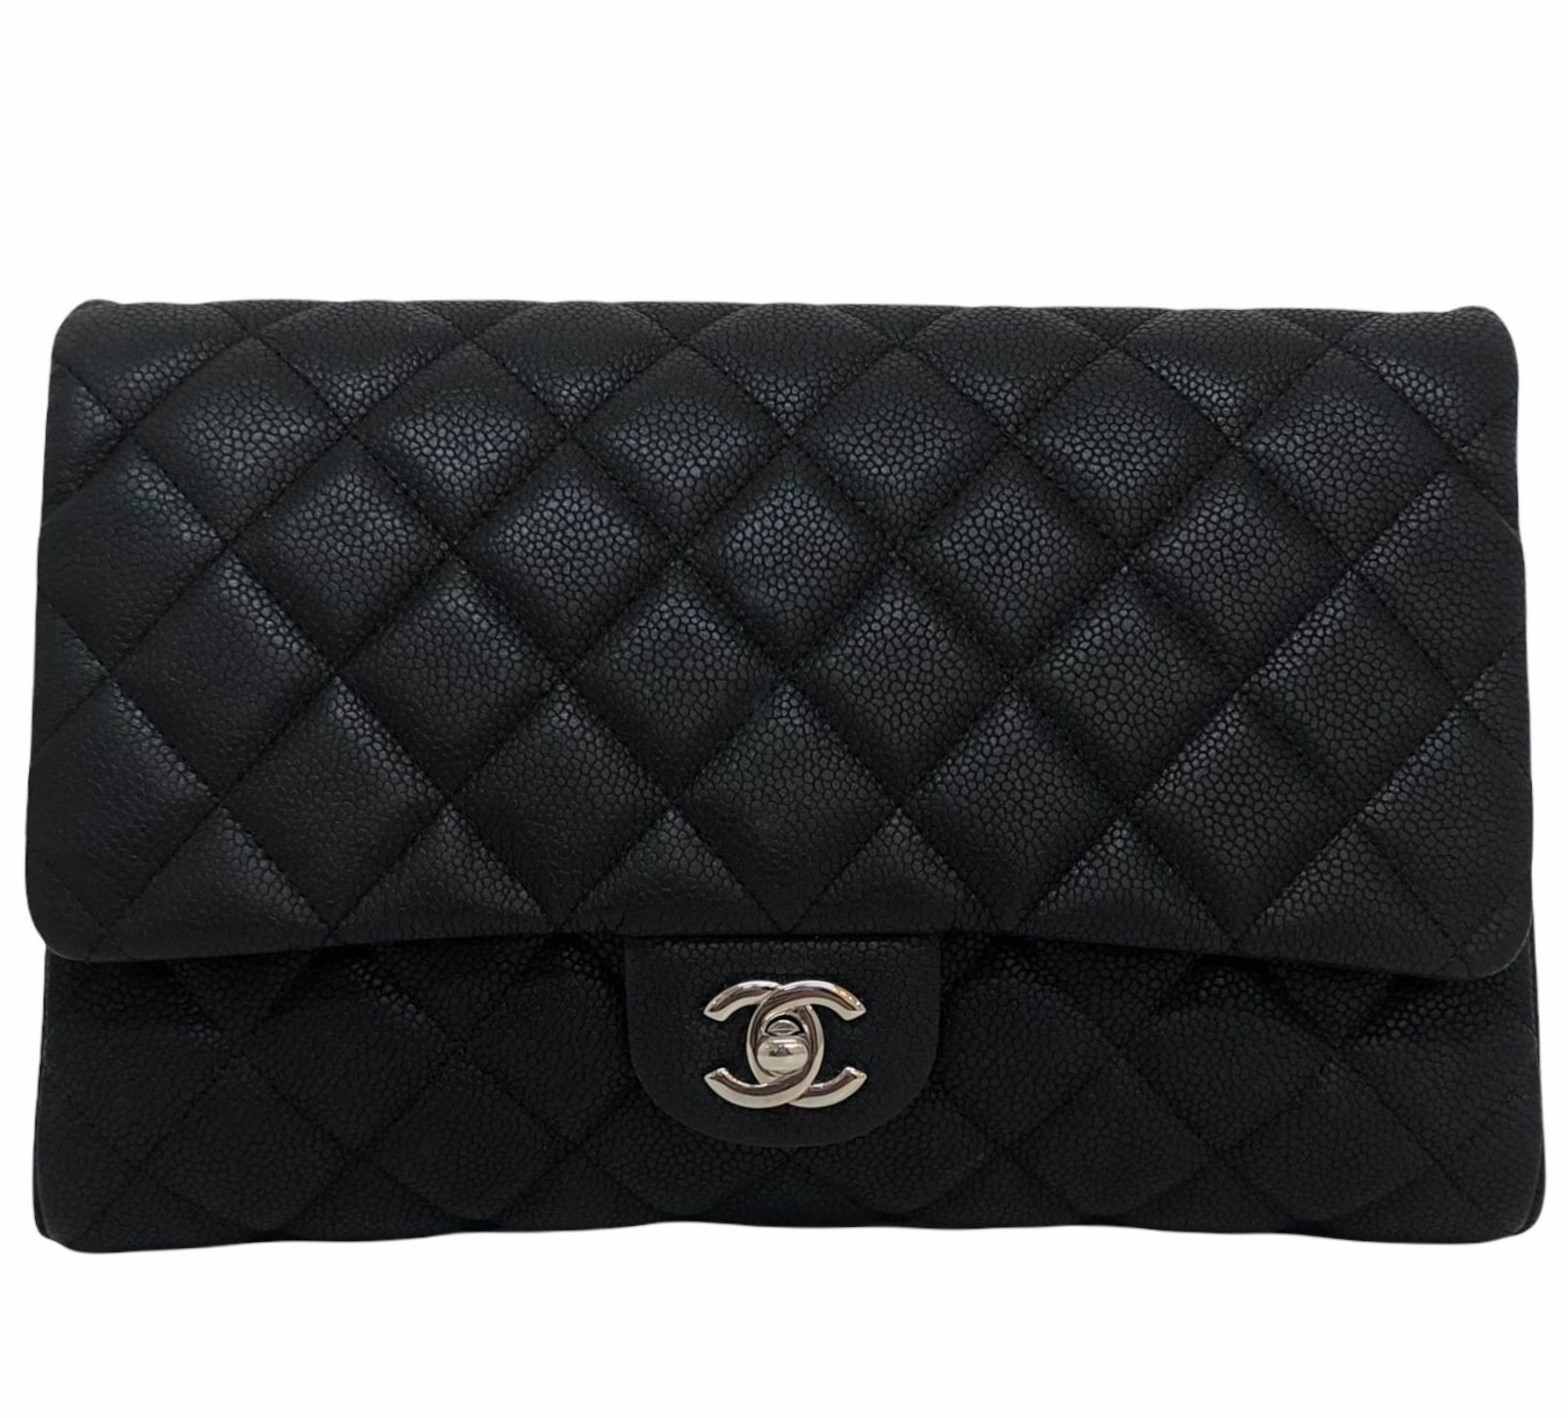 Bolsa Chanel Clutch With Chain Caviar Preta